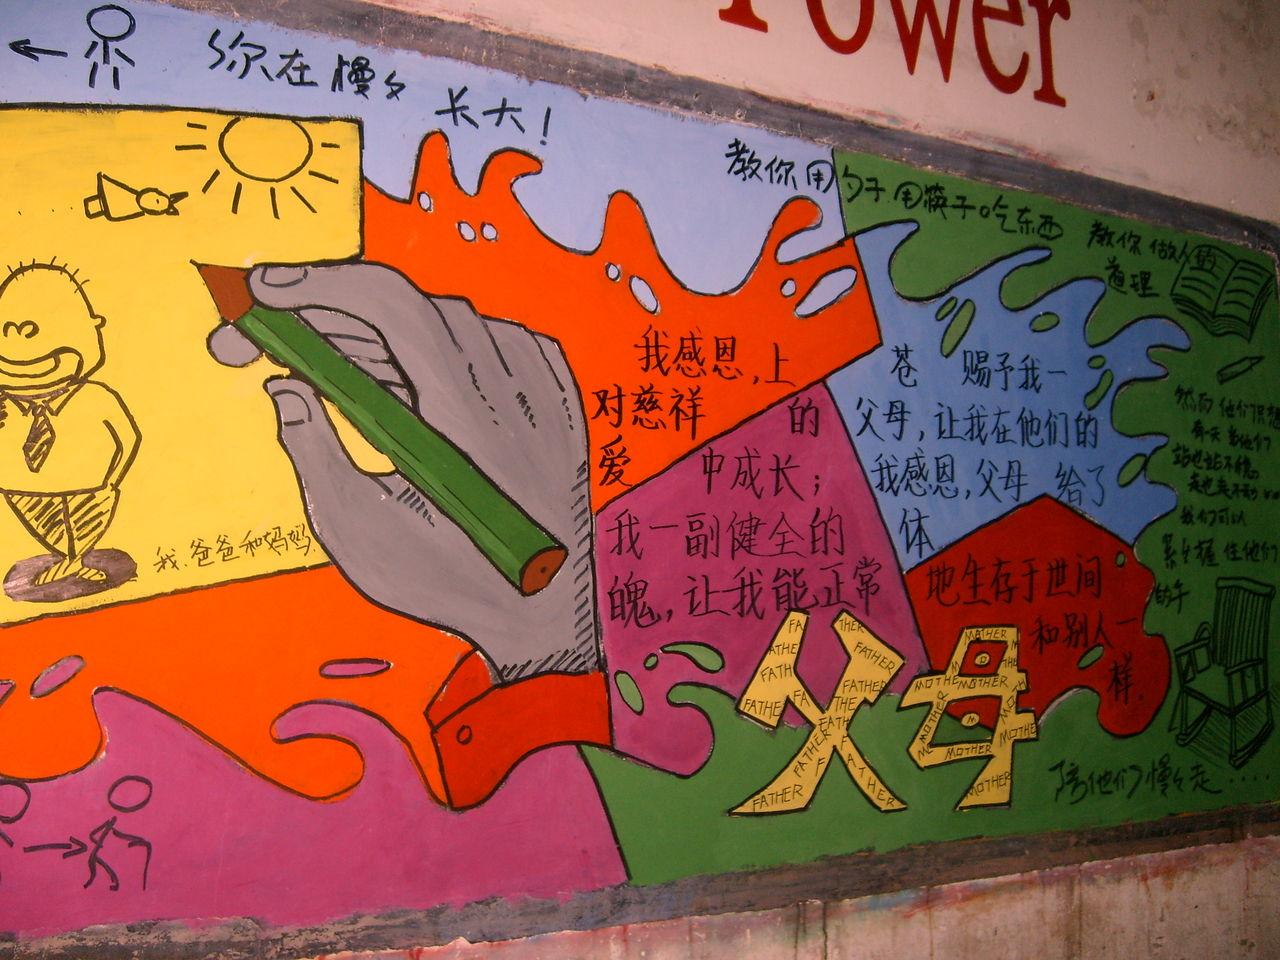 64432b 引用咒怨の天斩(6楼) 其实,你的板报算是手抄报的图片